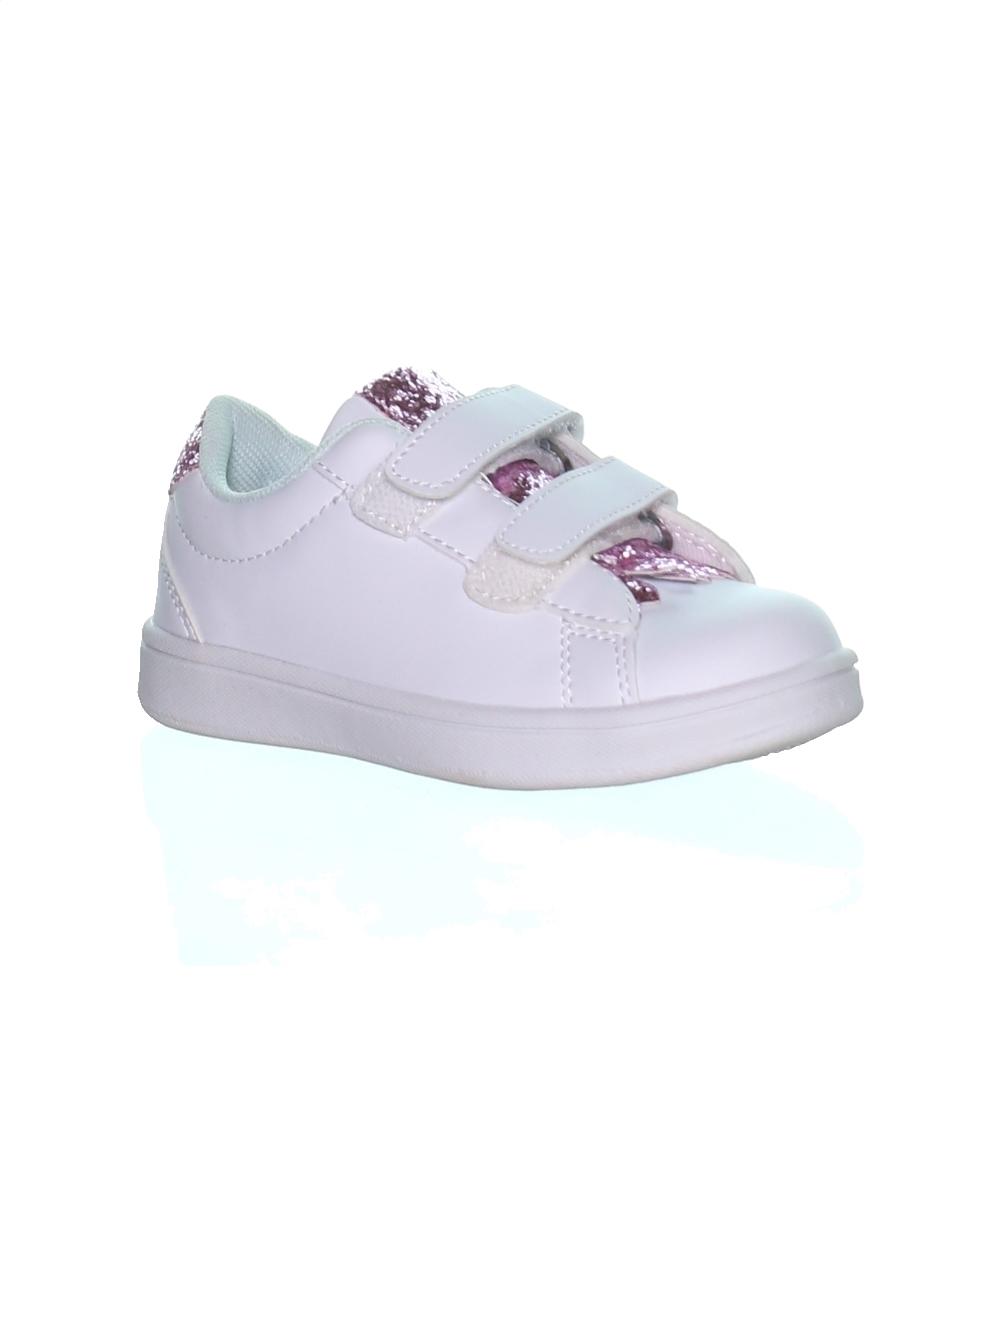 pas mal 970aa 11171 Chaussures à scratch Fille GEMO 27 pas cher, 12.99 € - #1214018